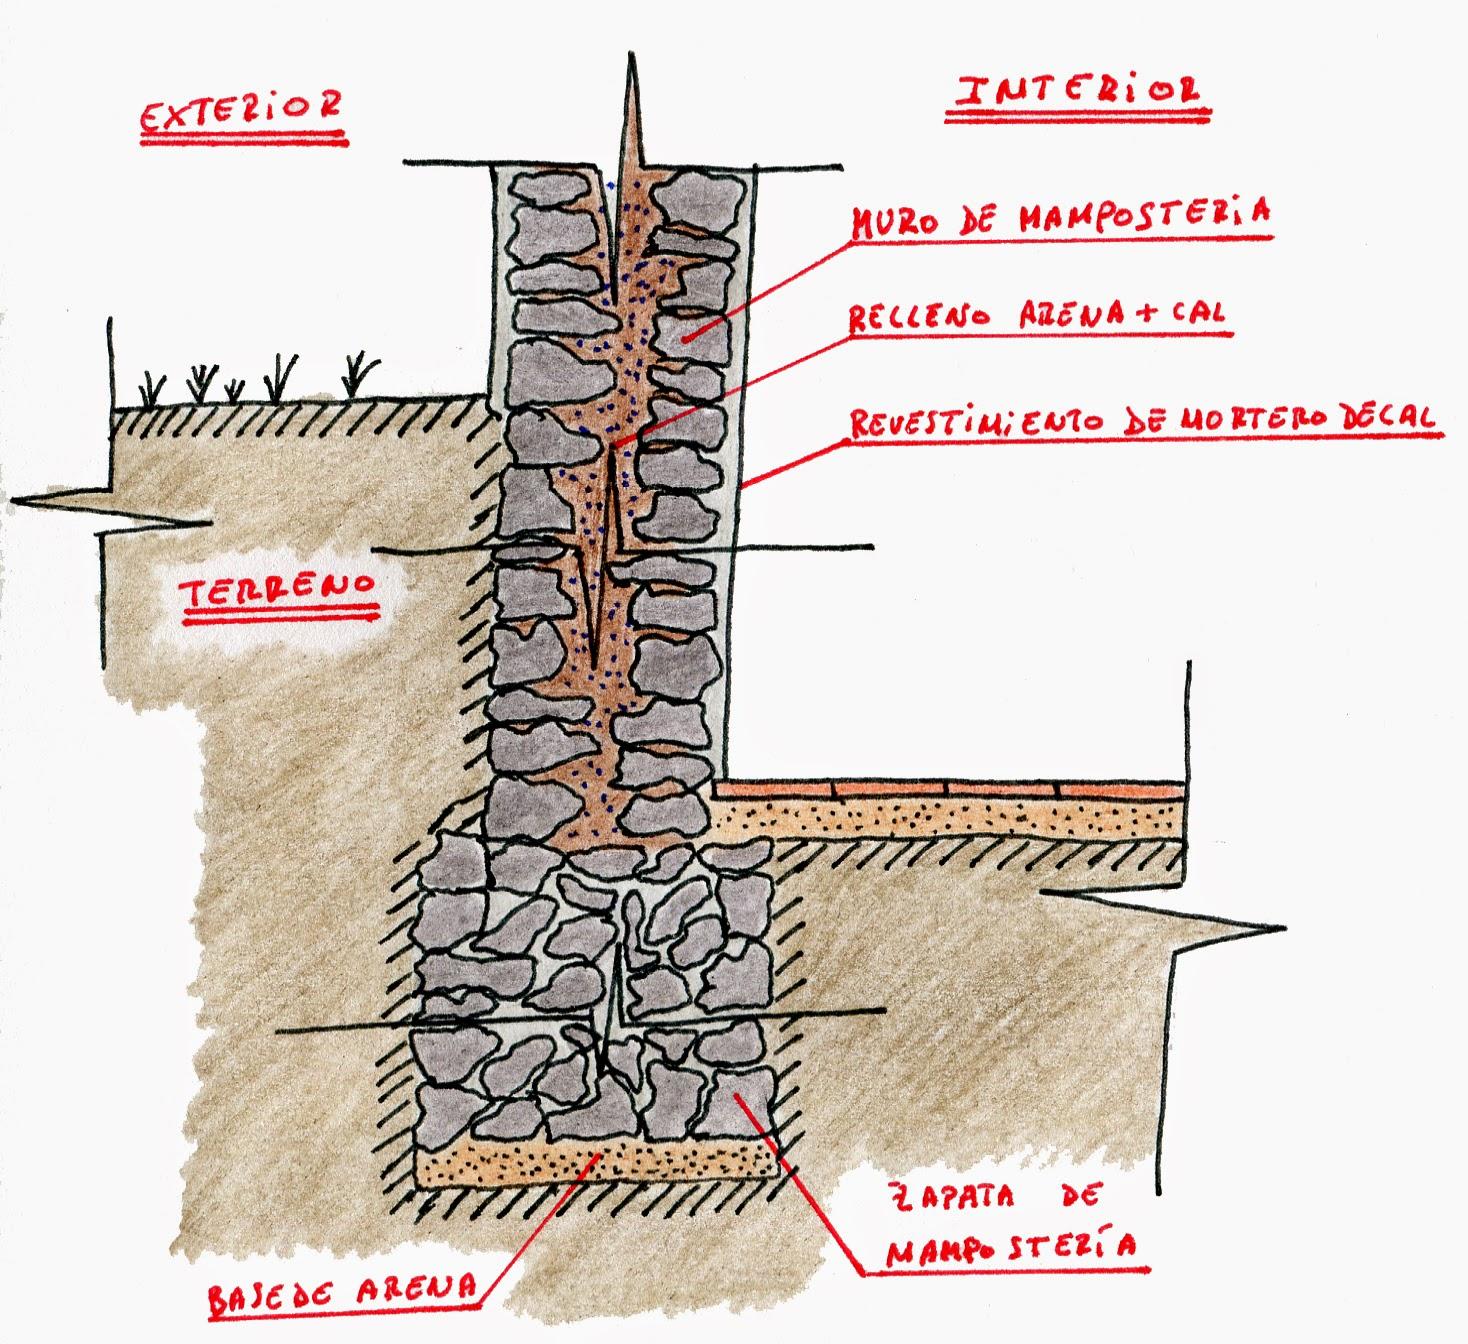 Muro de mamposteria de piedra fabulous fotomural mares - Tipos de muros de piedra ...